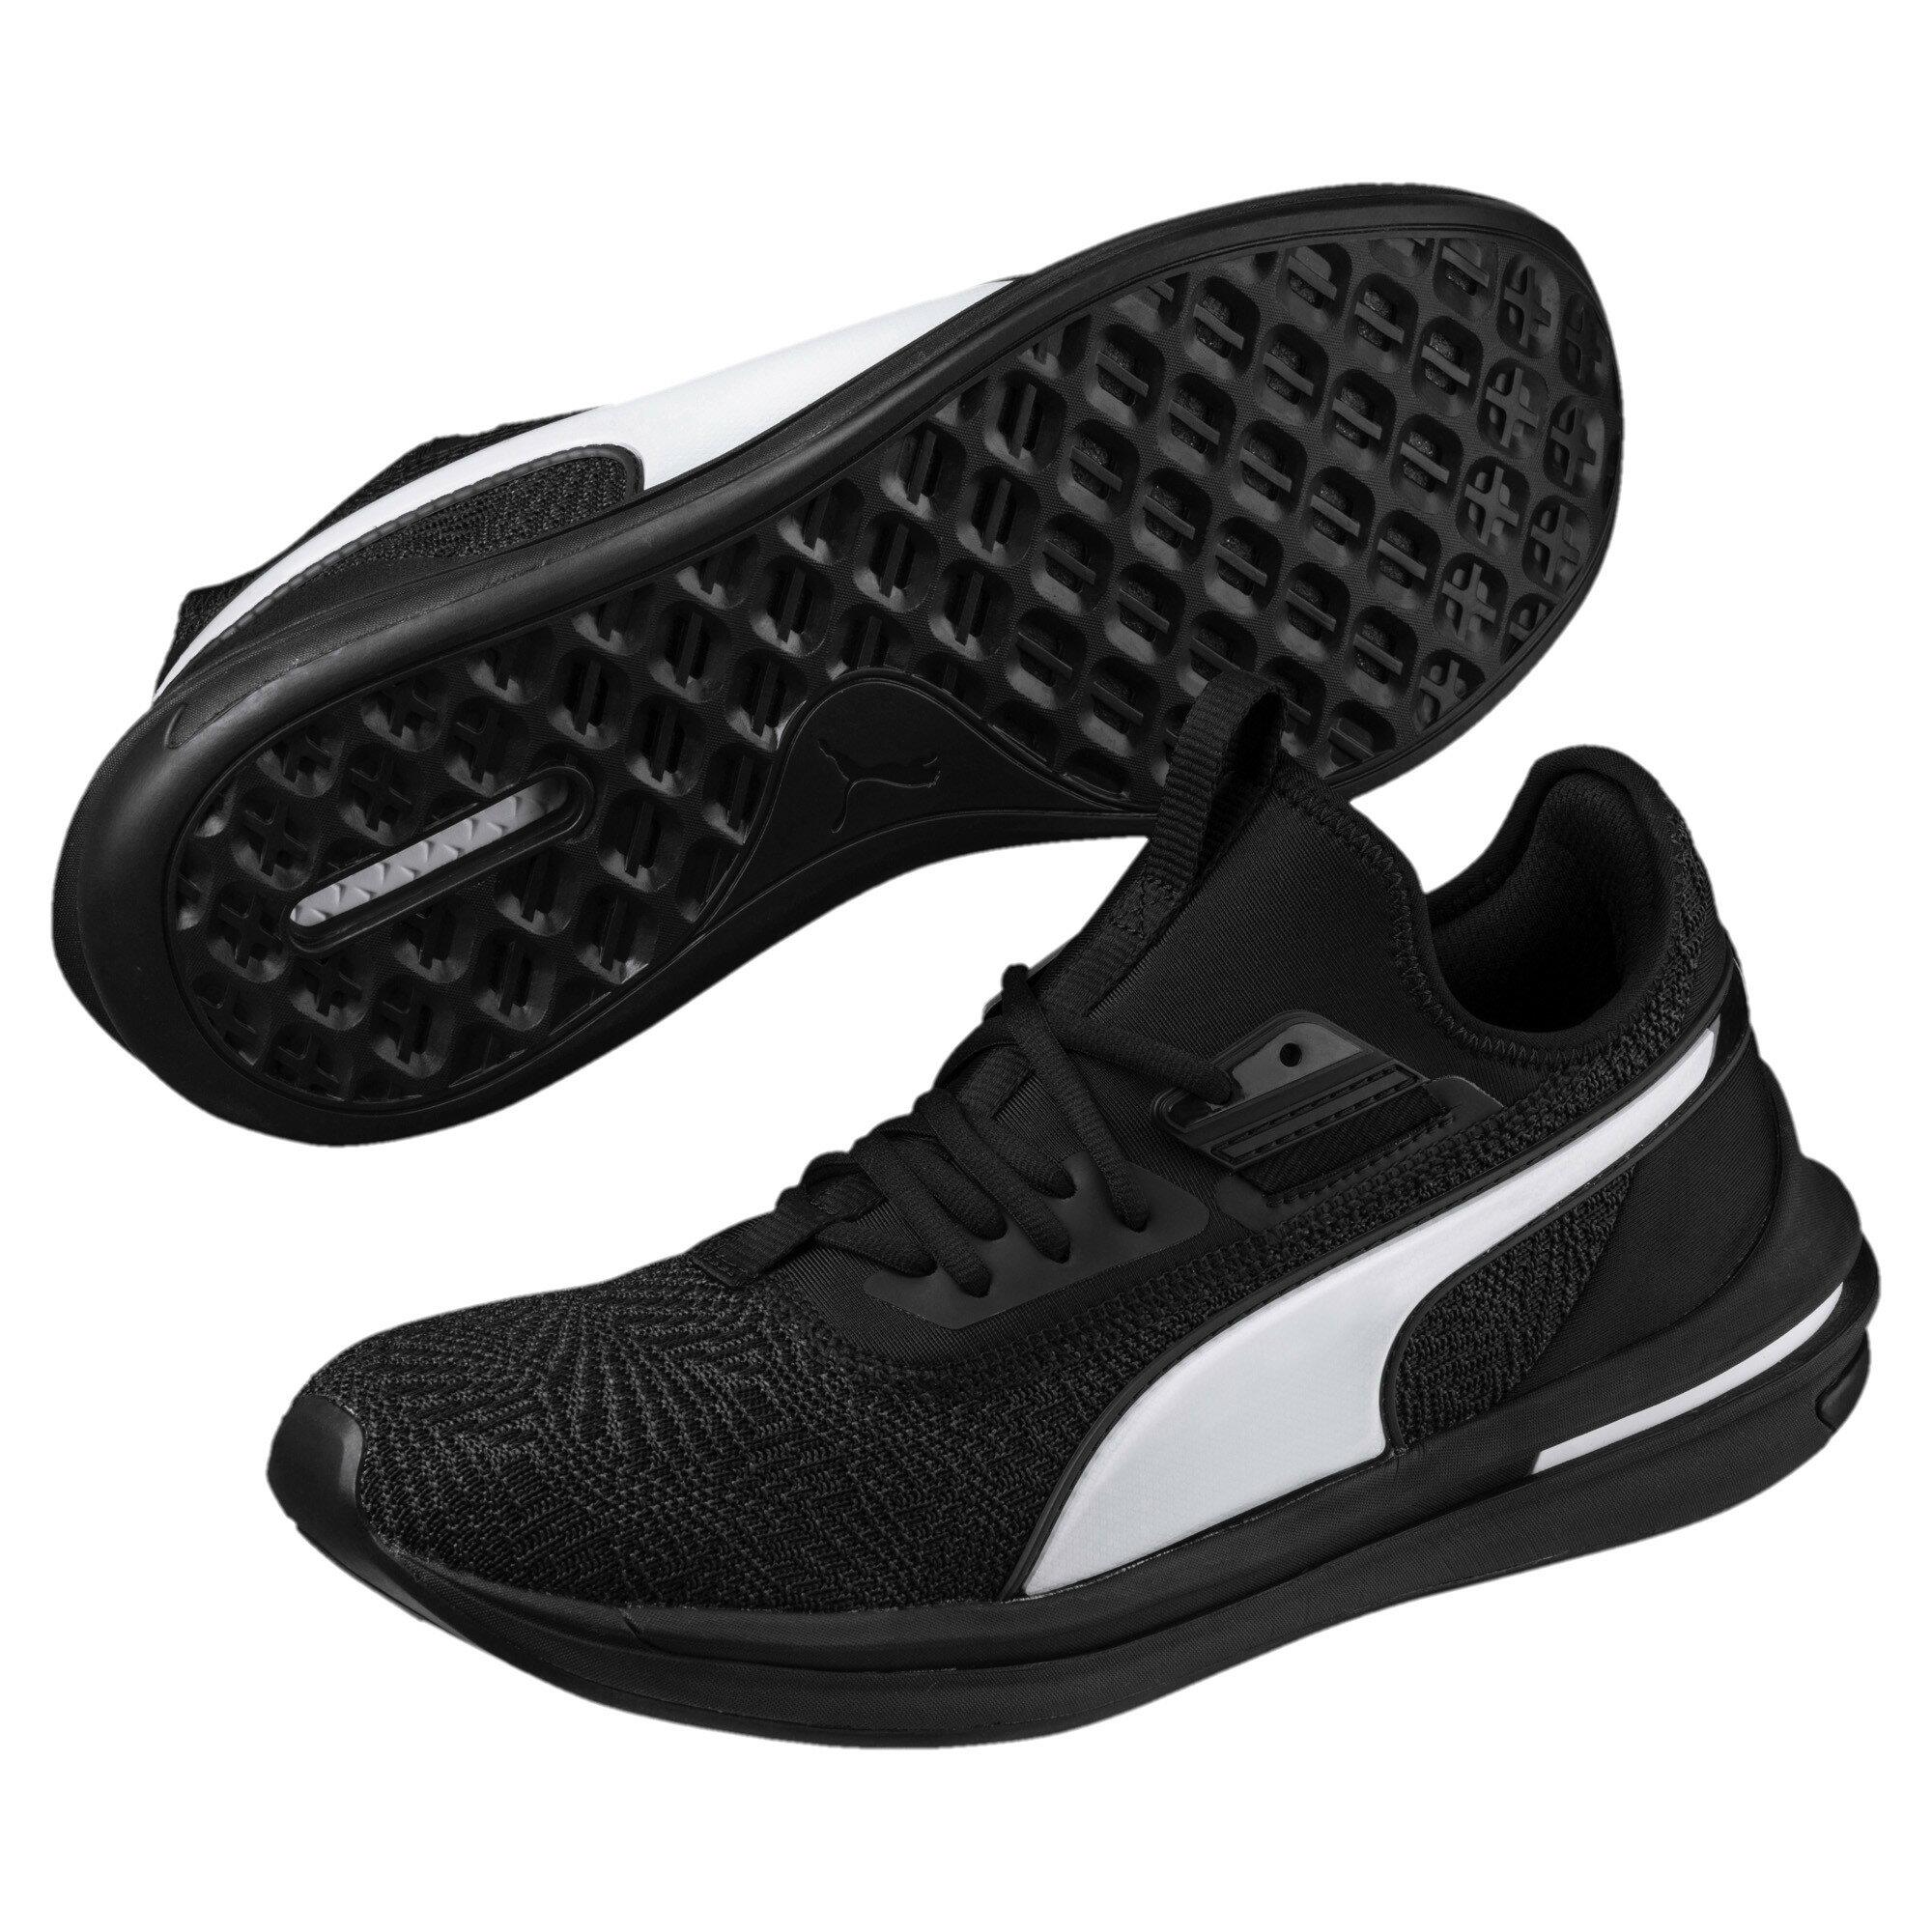 bcd4c4f82f2 Official Puma Store  PUMA IGNITE Limitless SR-71 Running Shoes Men ...